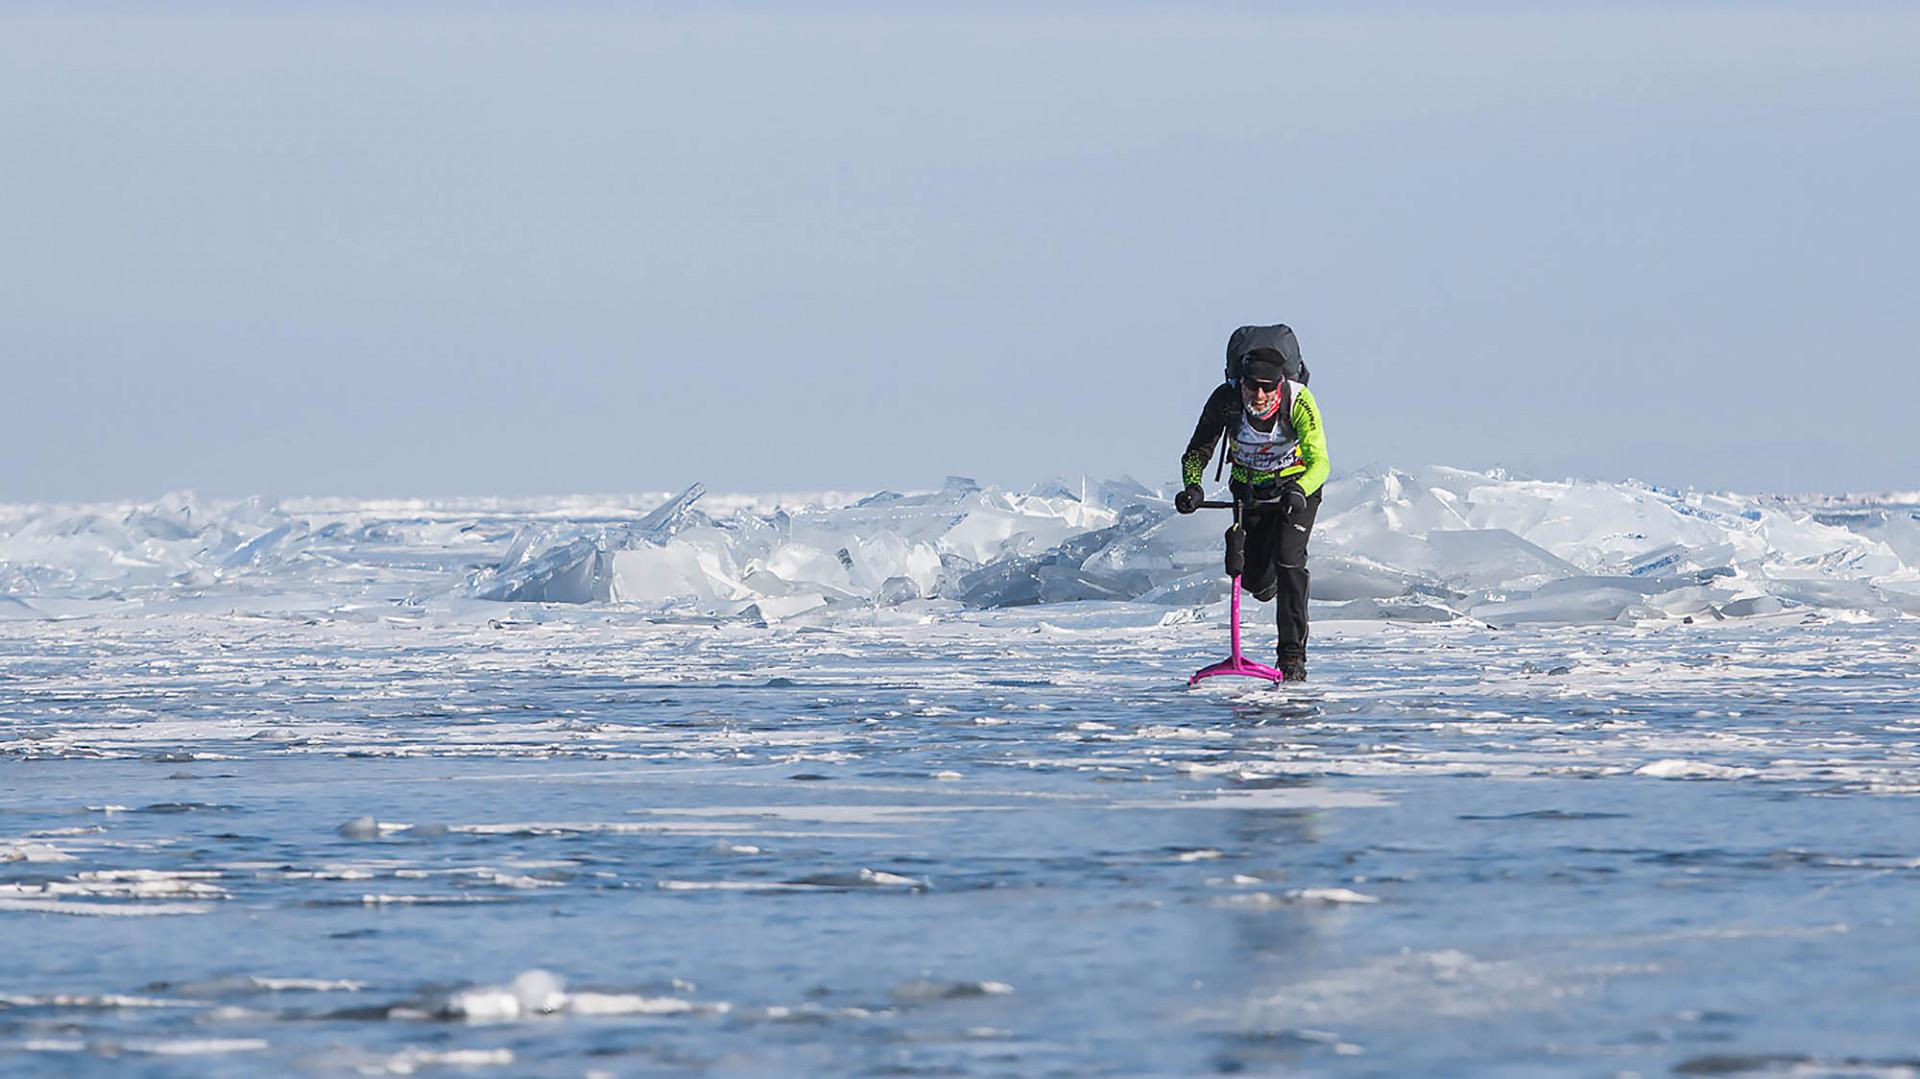 Russia Hosts Bone-Chilling Ice Marathon on Lake Baikal